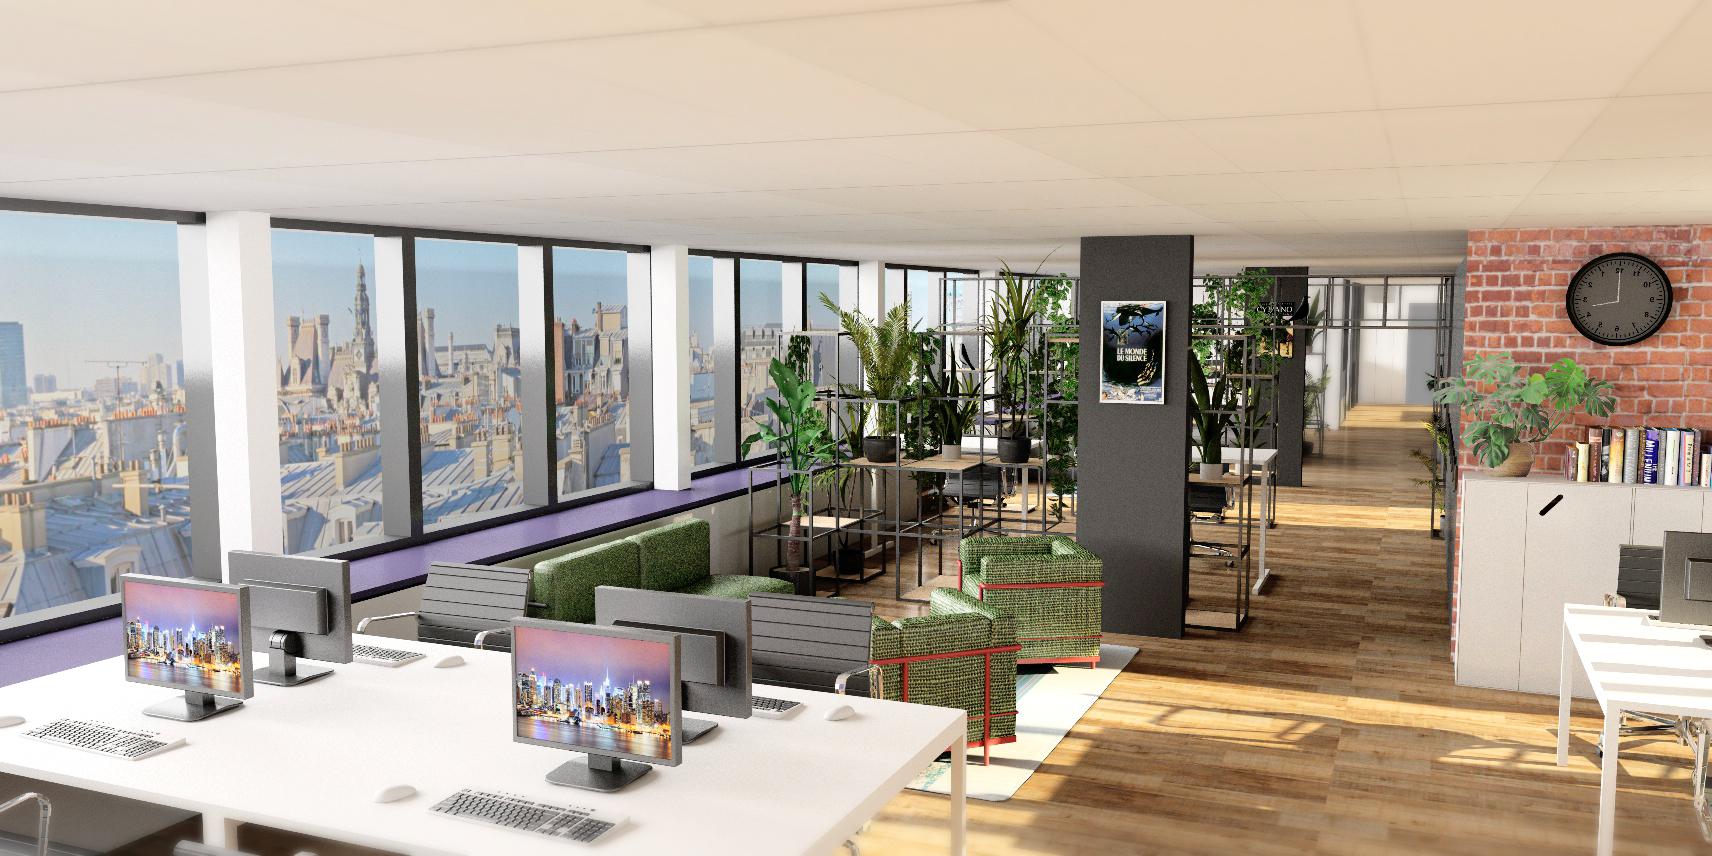 adv studio - nicolas vade - architecture interieur -lagardere 2.jpg